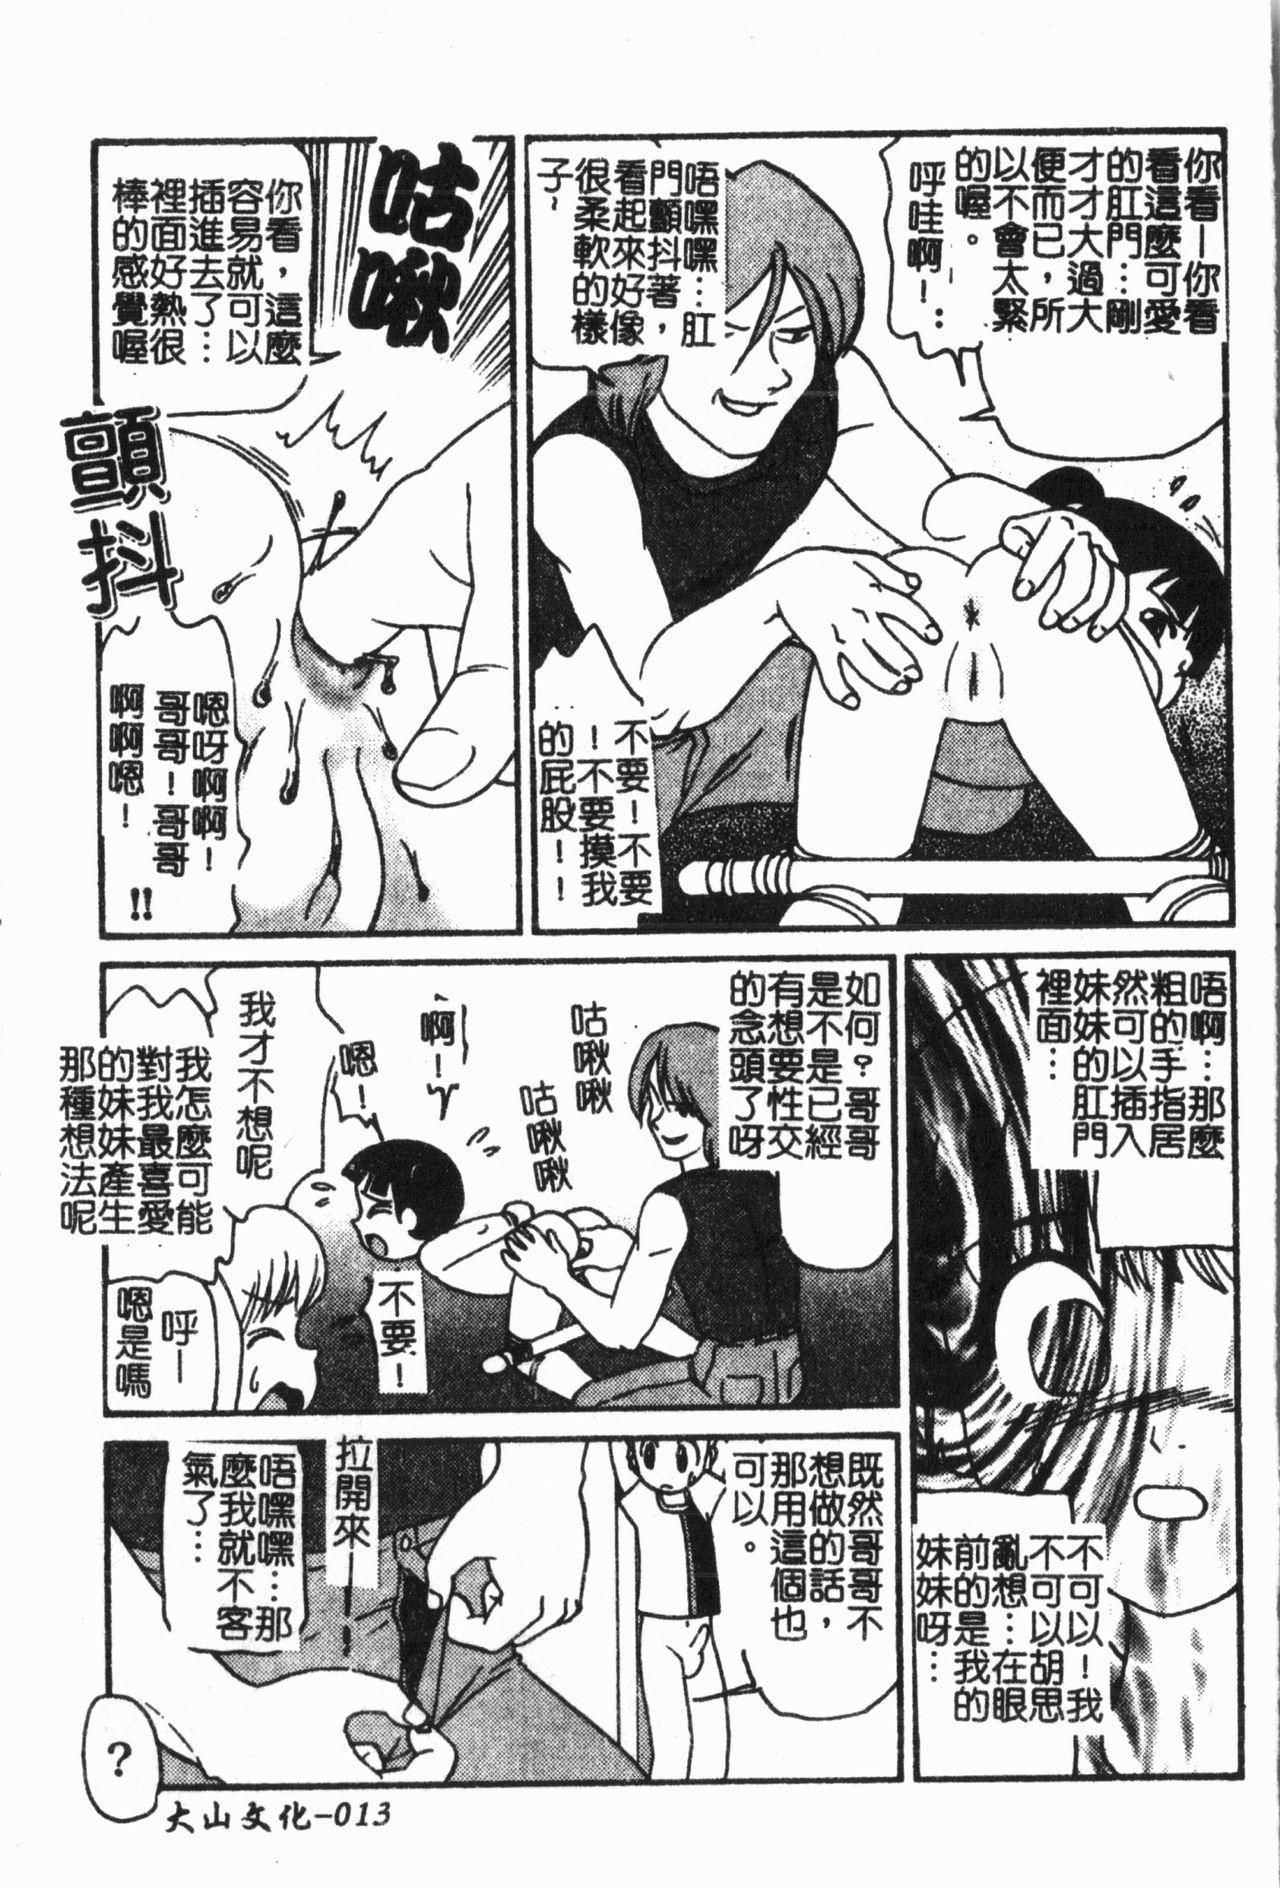 Imouto Koishi 6 15